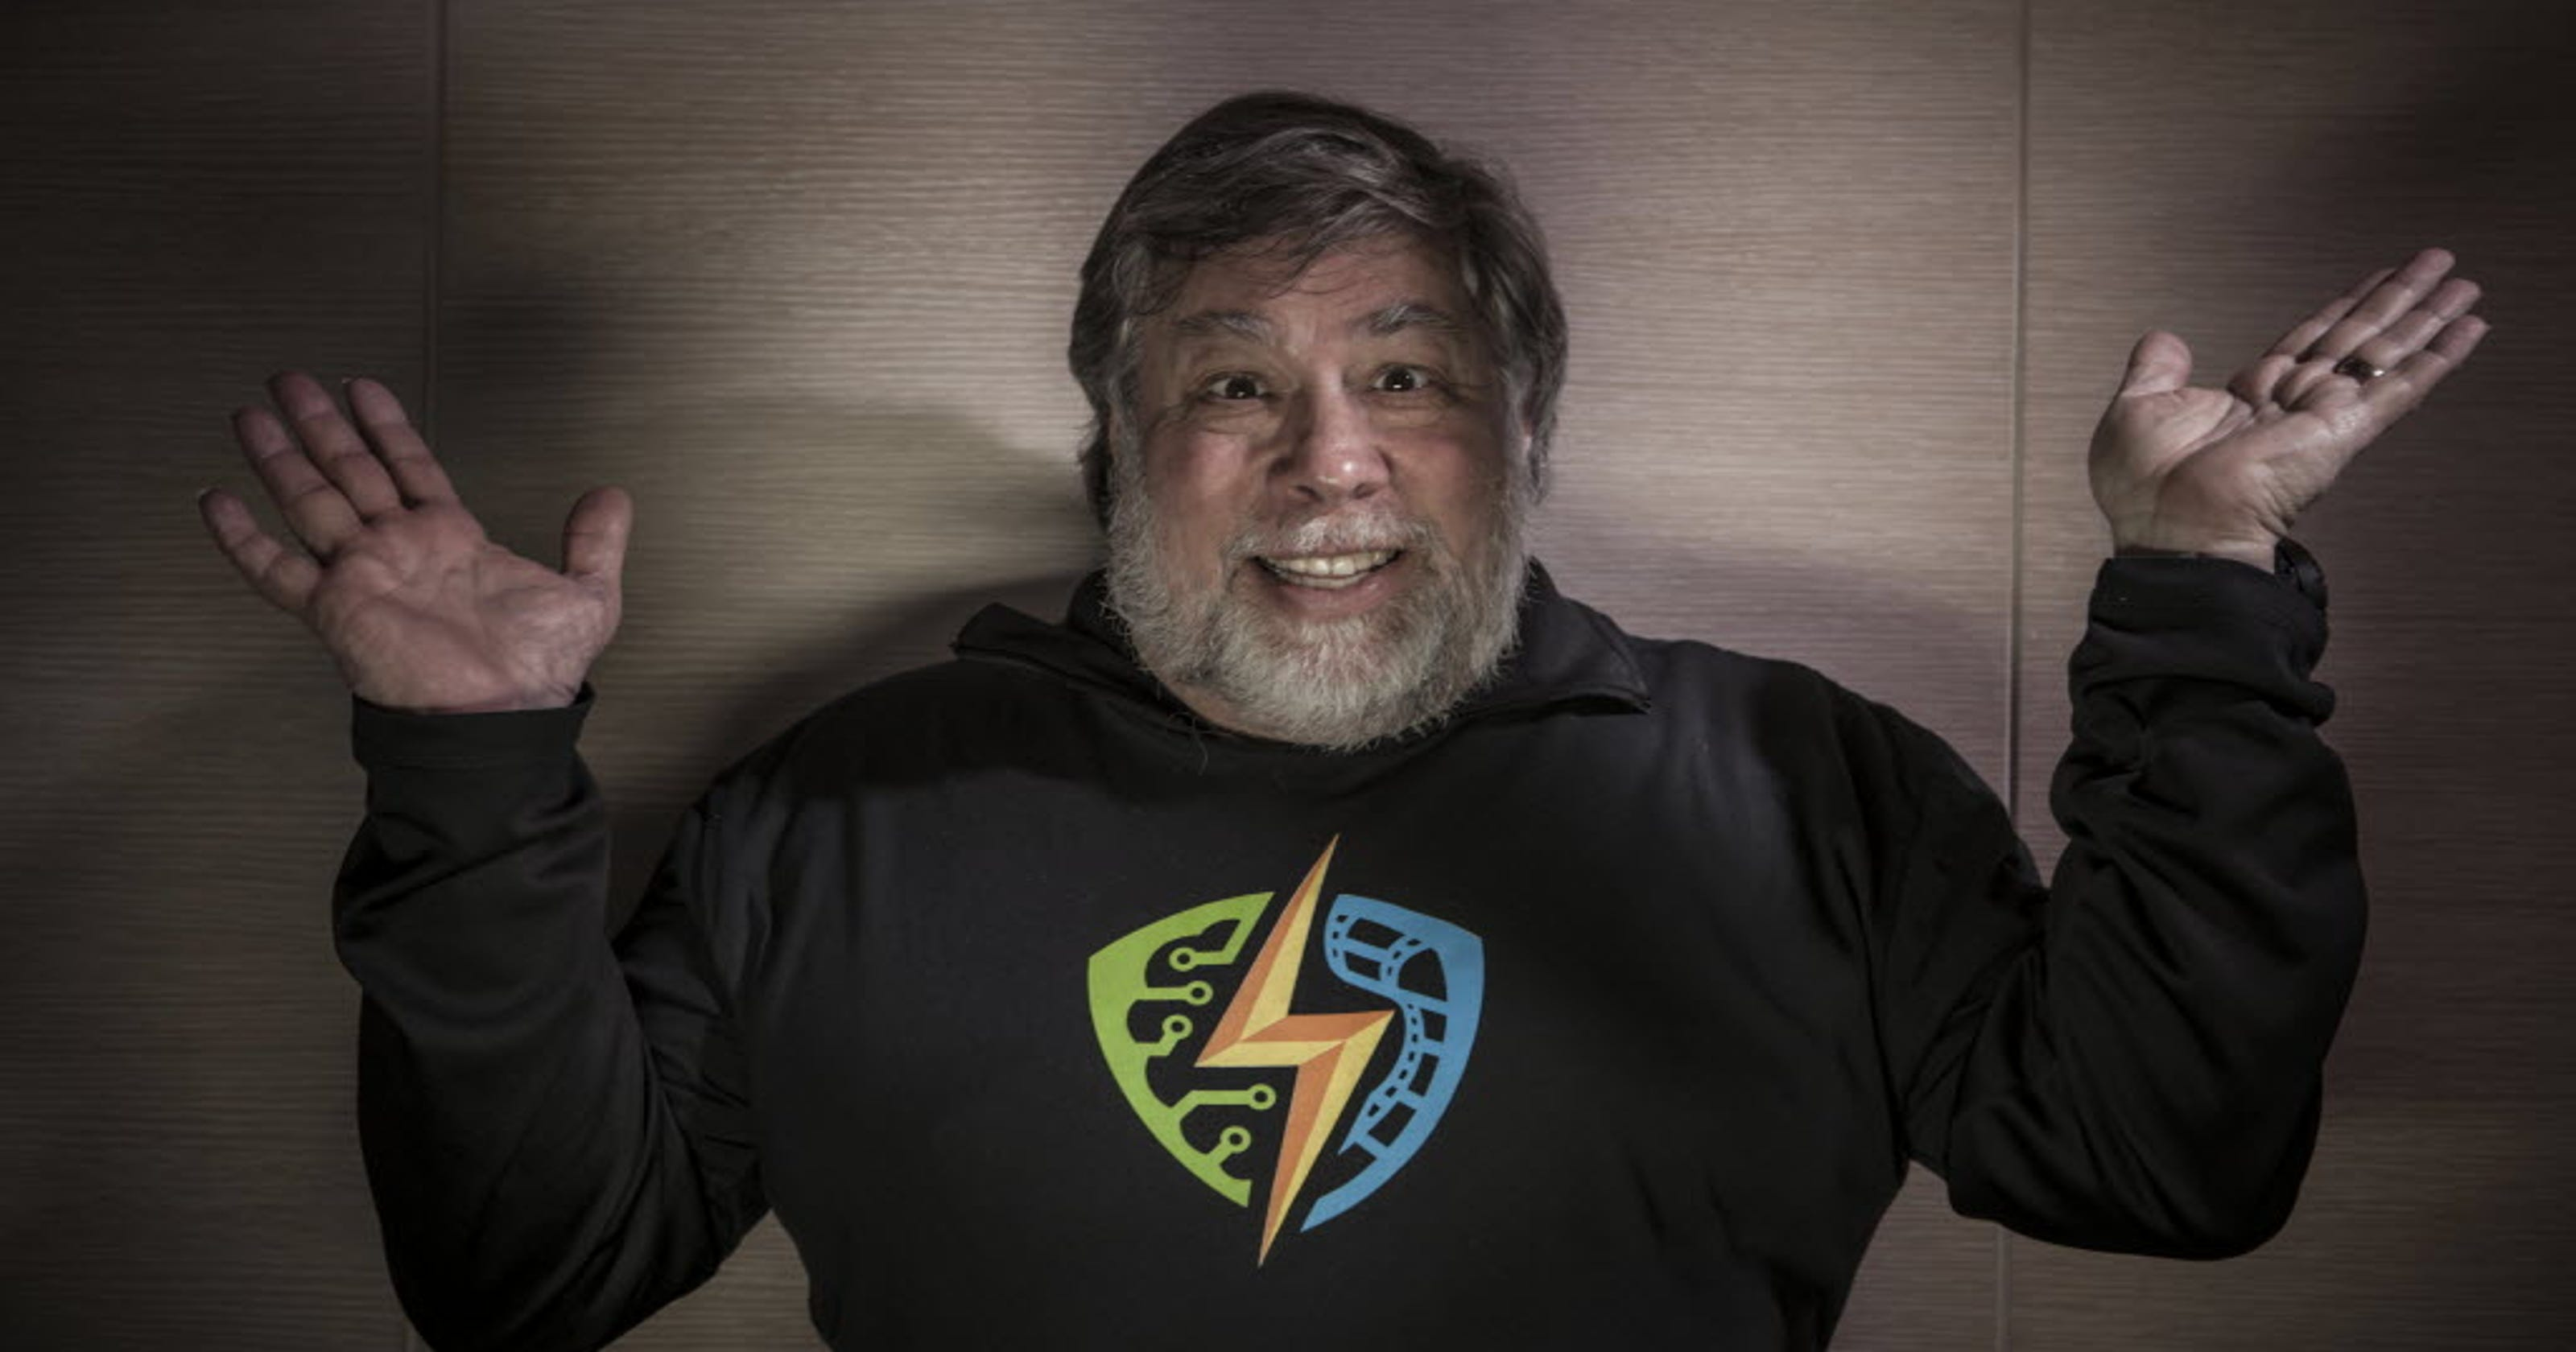 Apple co-founder Steve Wozniak's Comic Con pitch